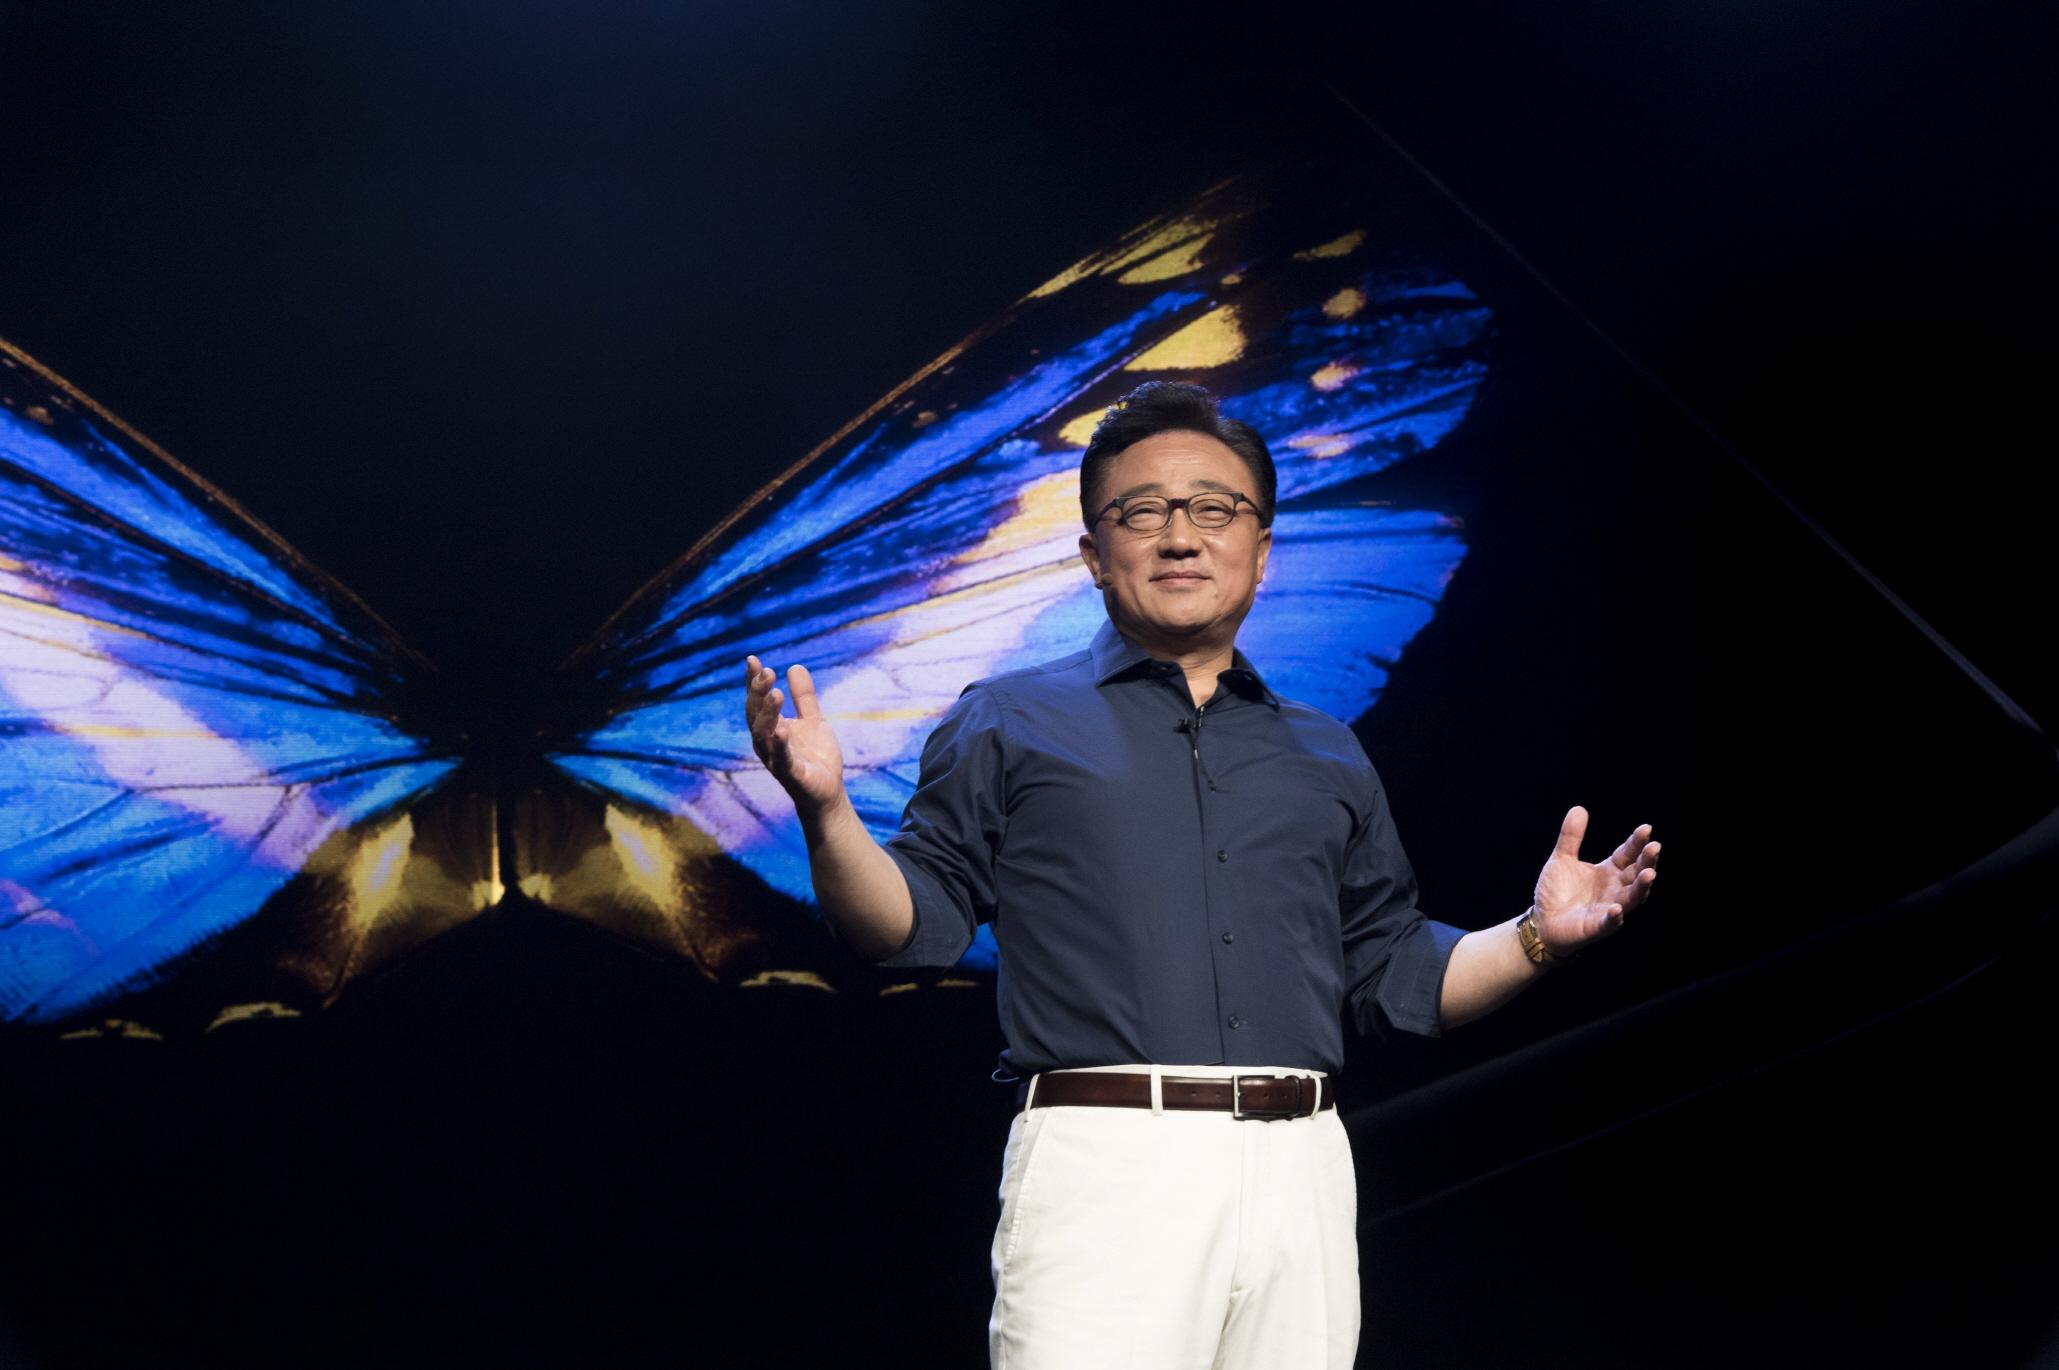 Samsung releva a Celestino García de su cargo de vicepresidente corporativo